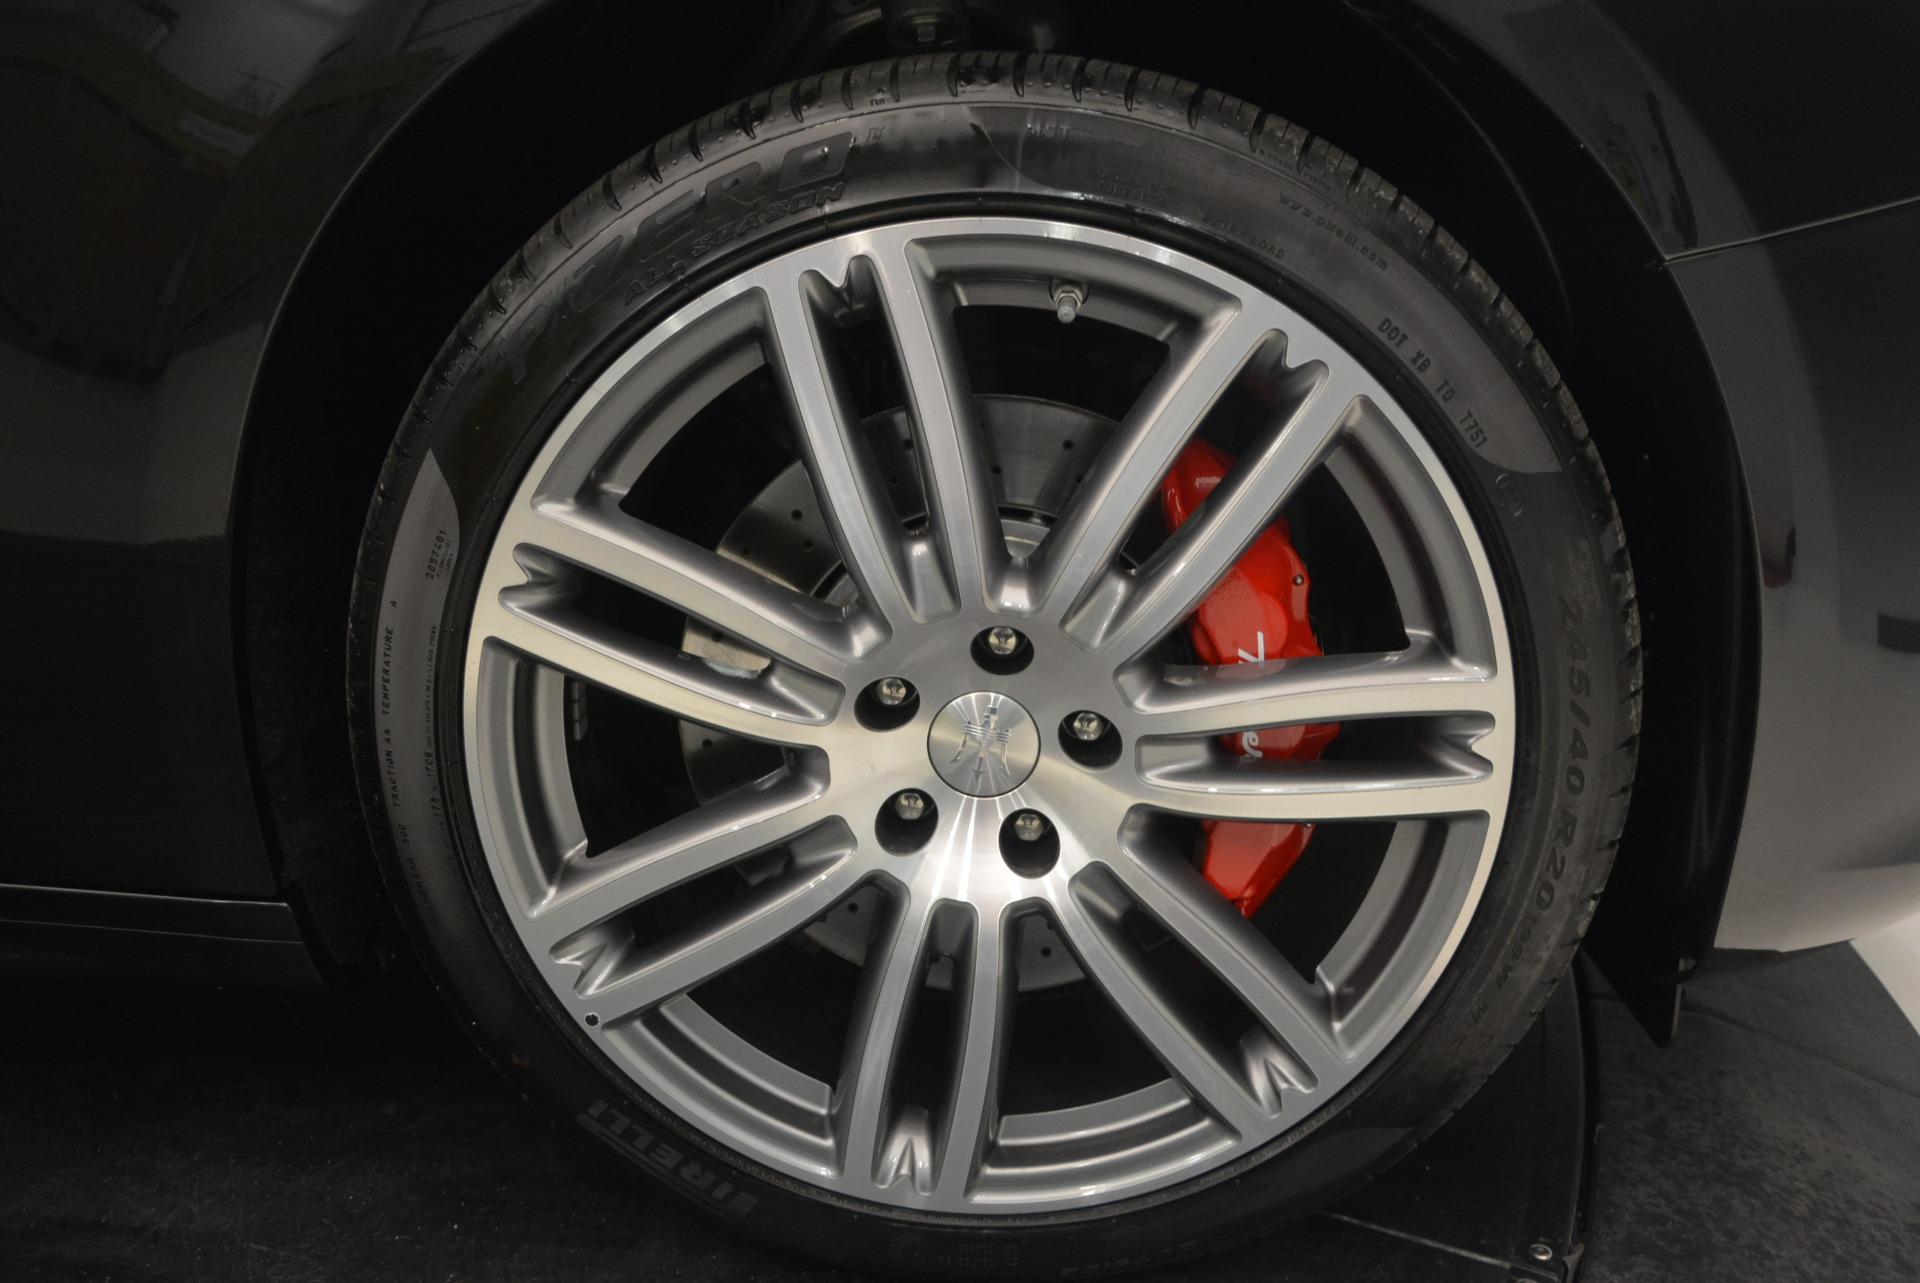 New 2018 Maserati Ghibli S Q4 Gransport For Sale In Greenwich, CT 1936_p25